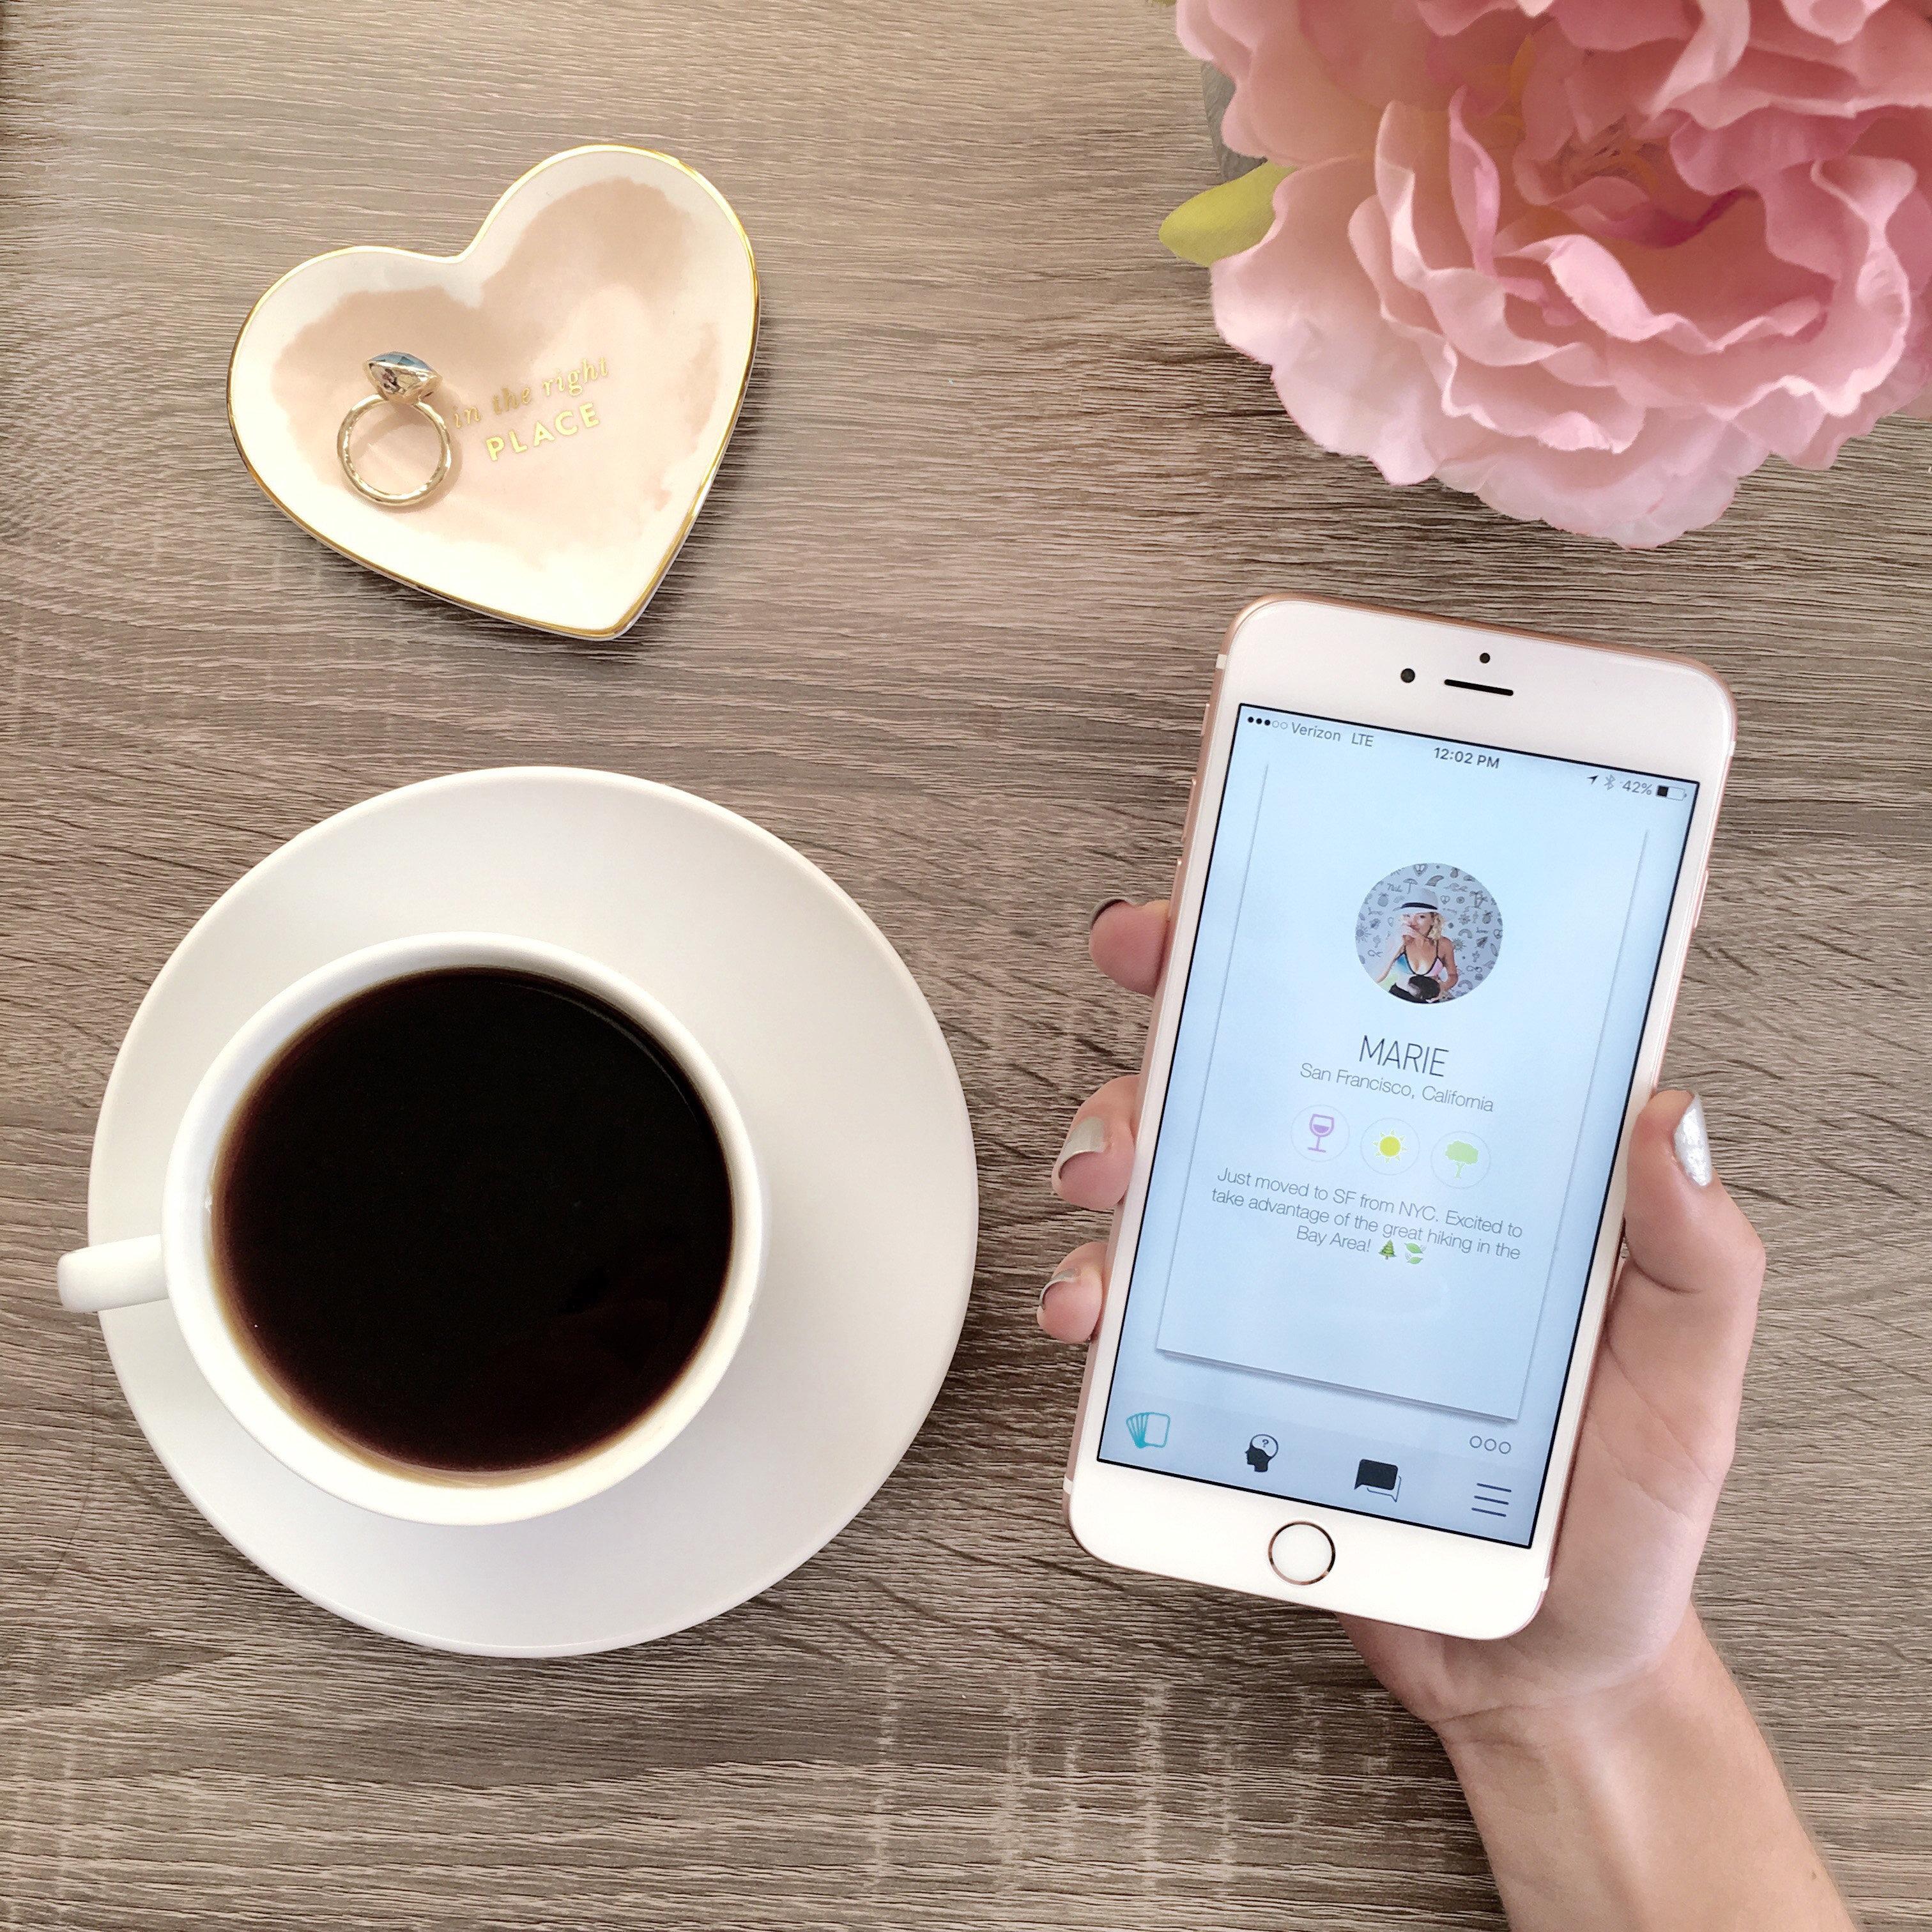 The start Hookup Use Cnn Grows In India App all presumption